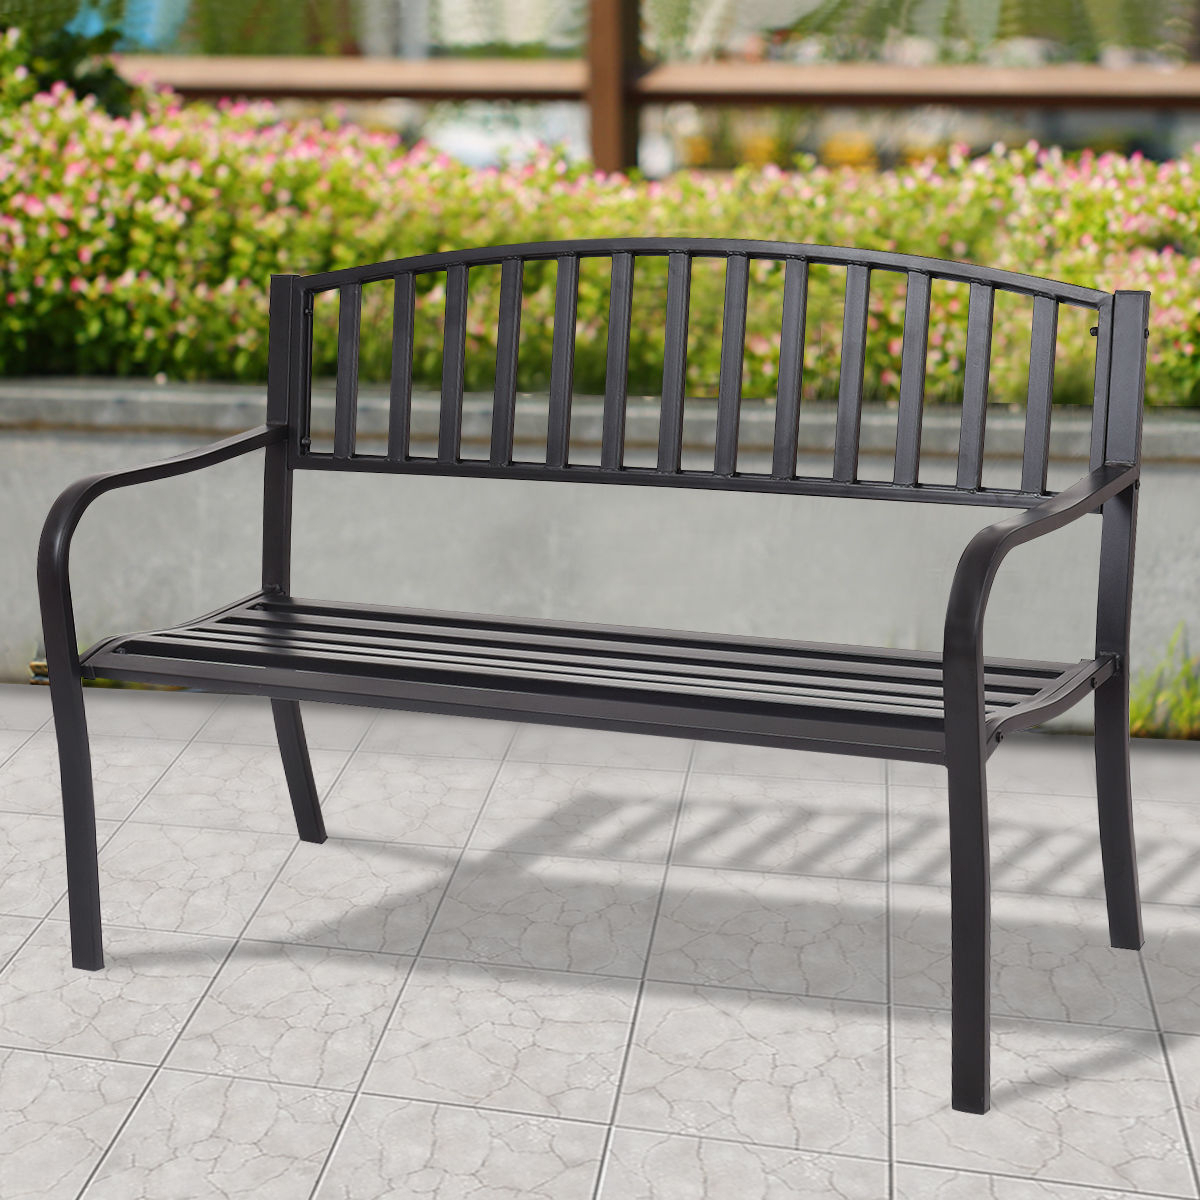 Latest Michelle Metal Garden Benches Regarding Costway 50'' Patio Garden Bench Park Yard Outdoor Furniture Steel Slats Porch Chair Seat – Walmart (View 9 of 30)